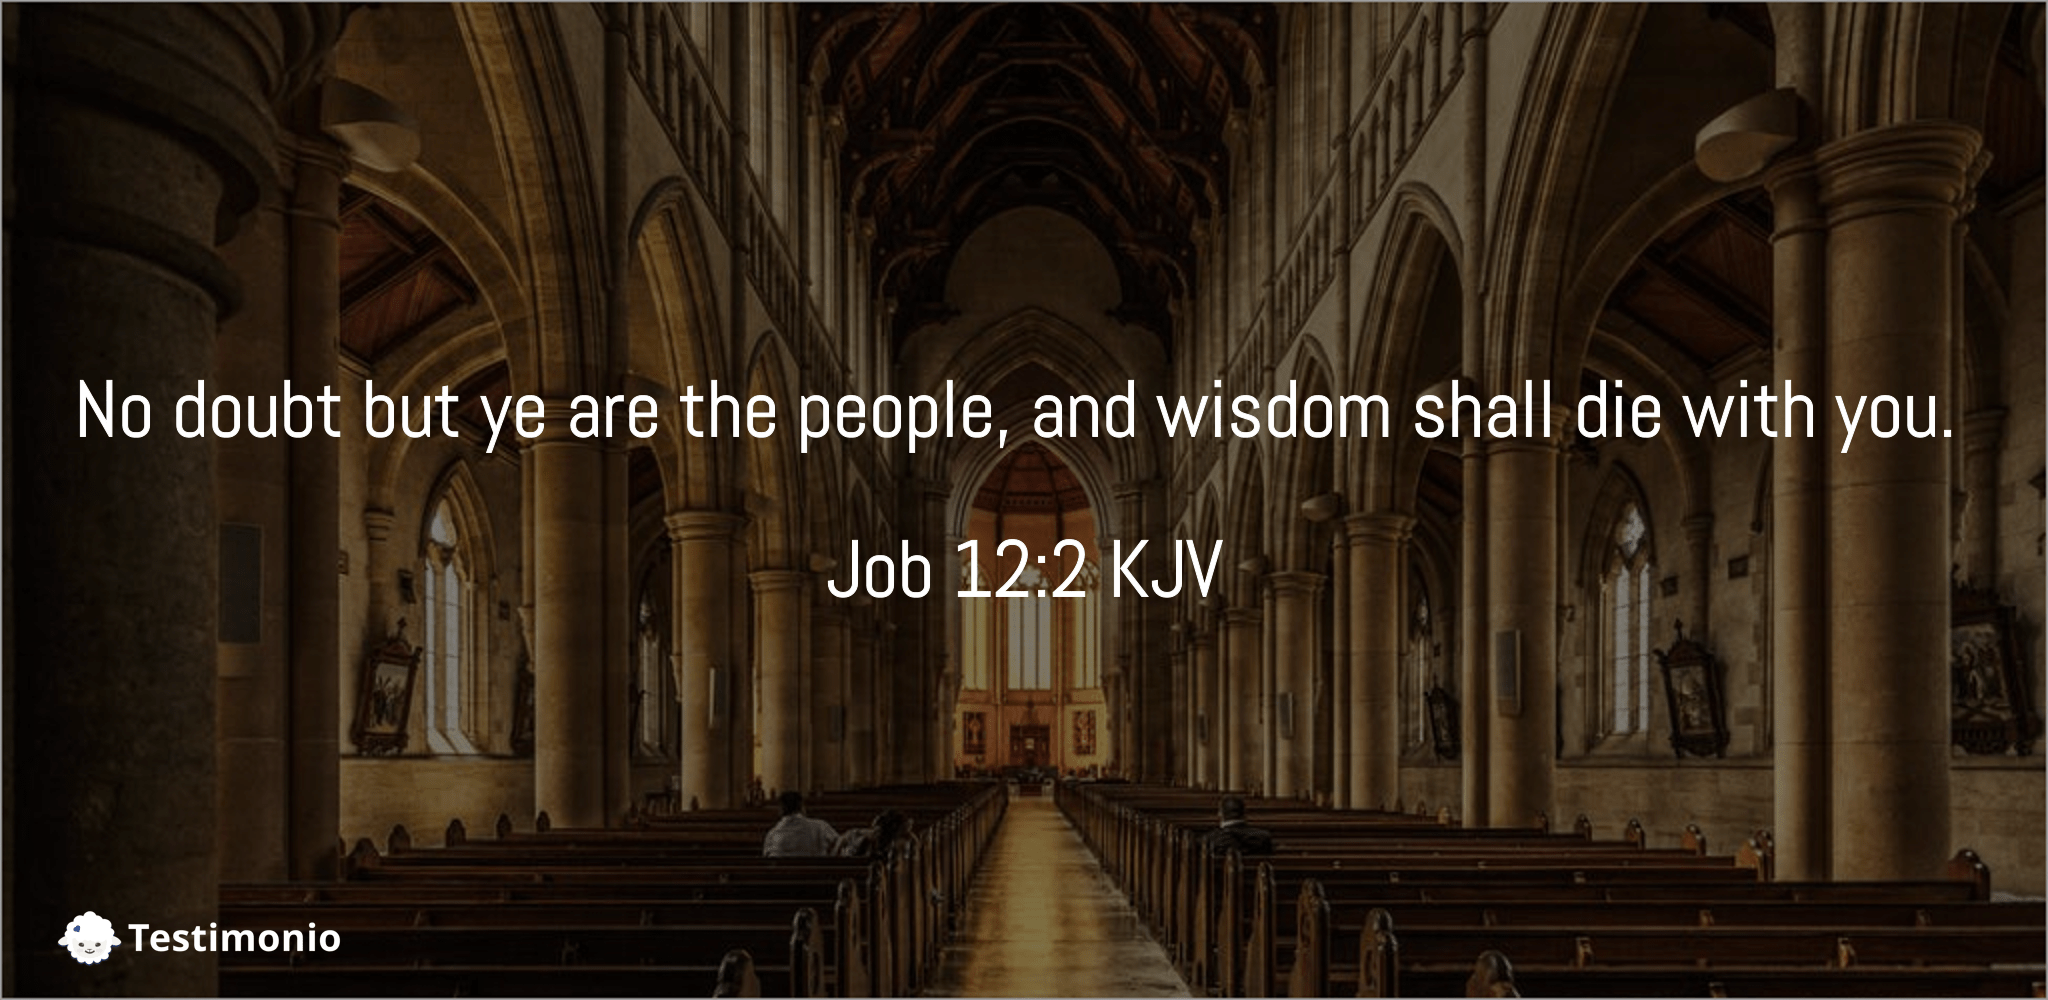 Job 12:2